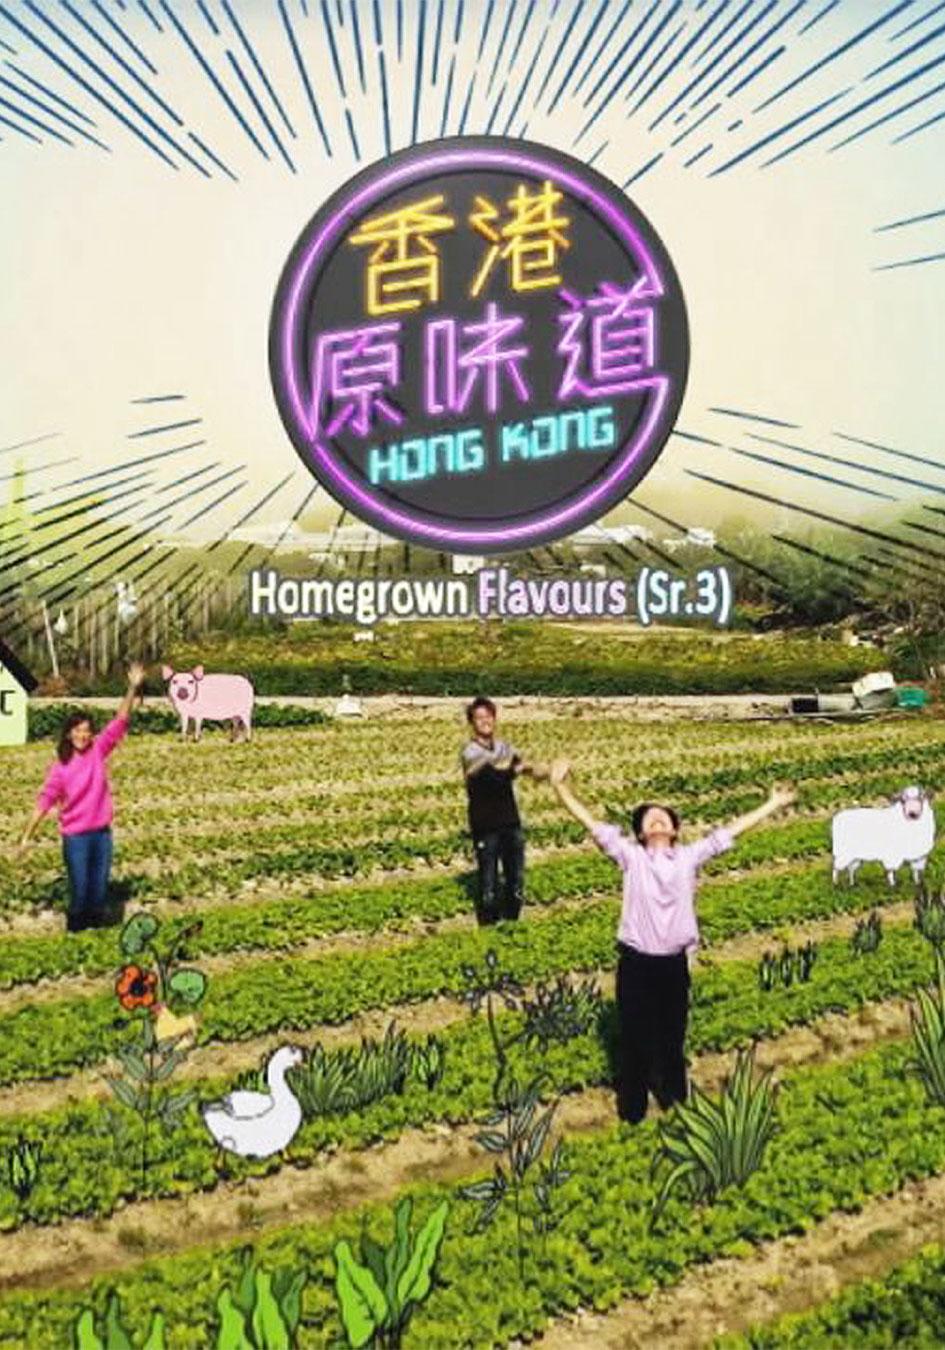 香港原味道 (Sr.3)   -Homegrown Flavours Sr 3